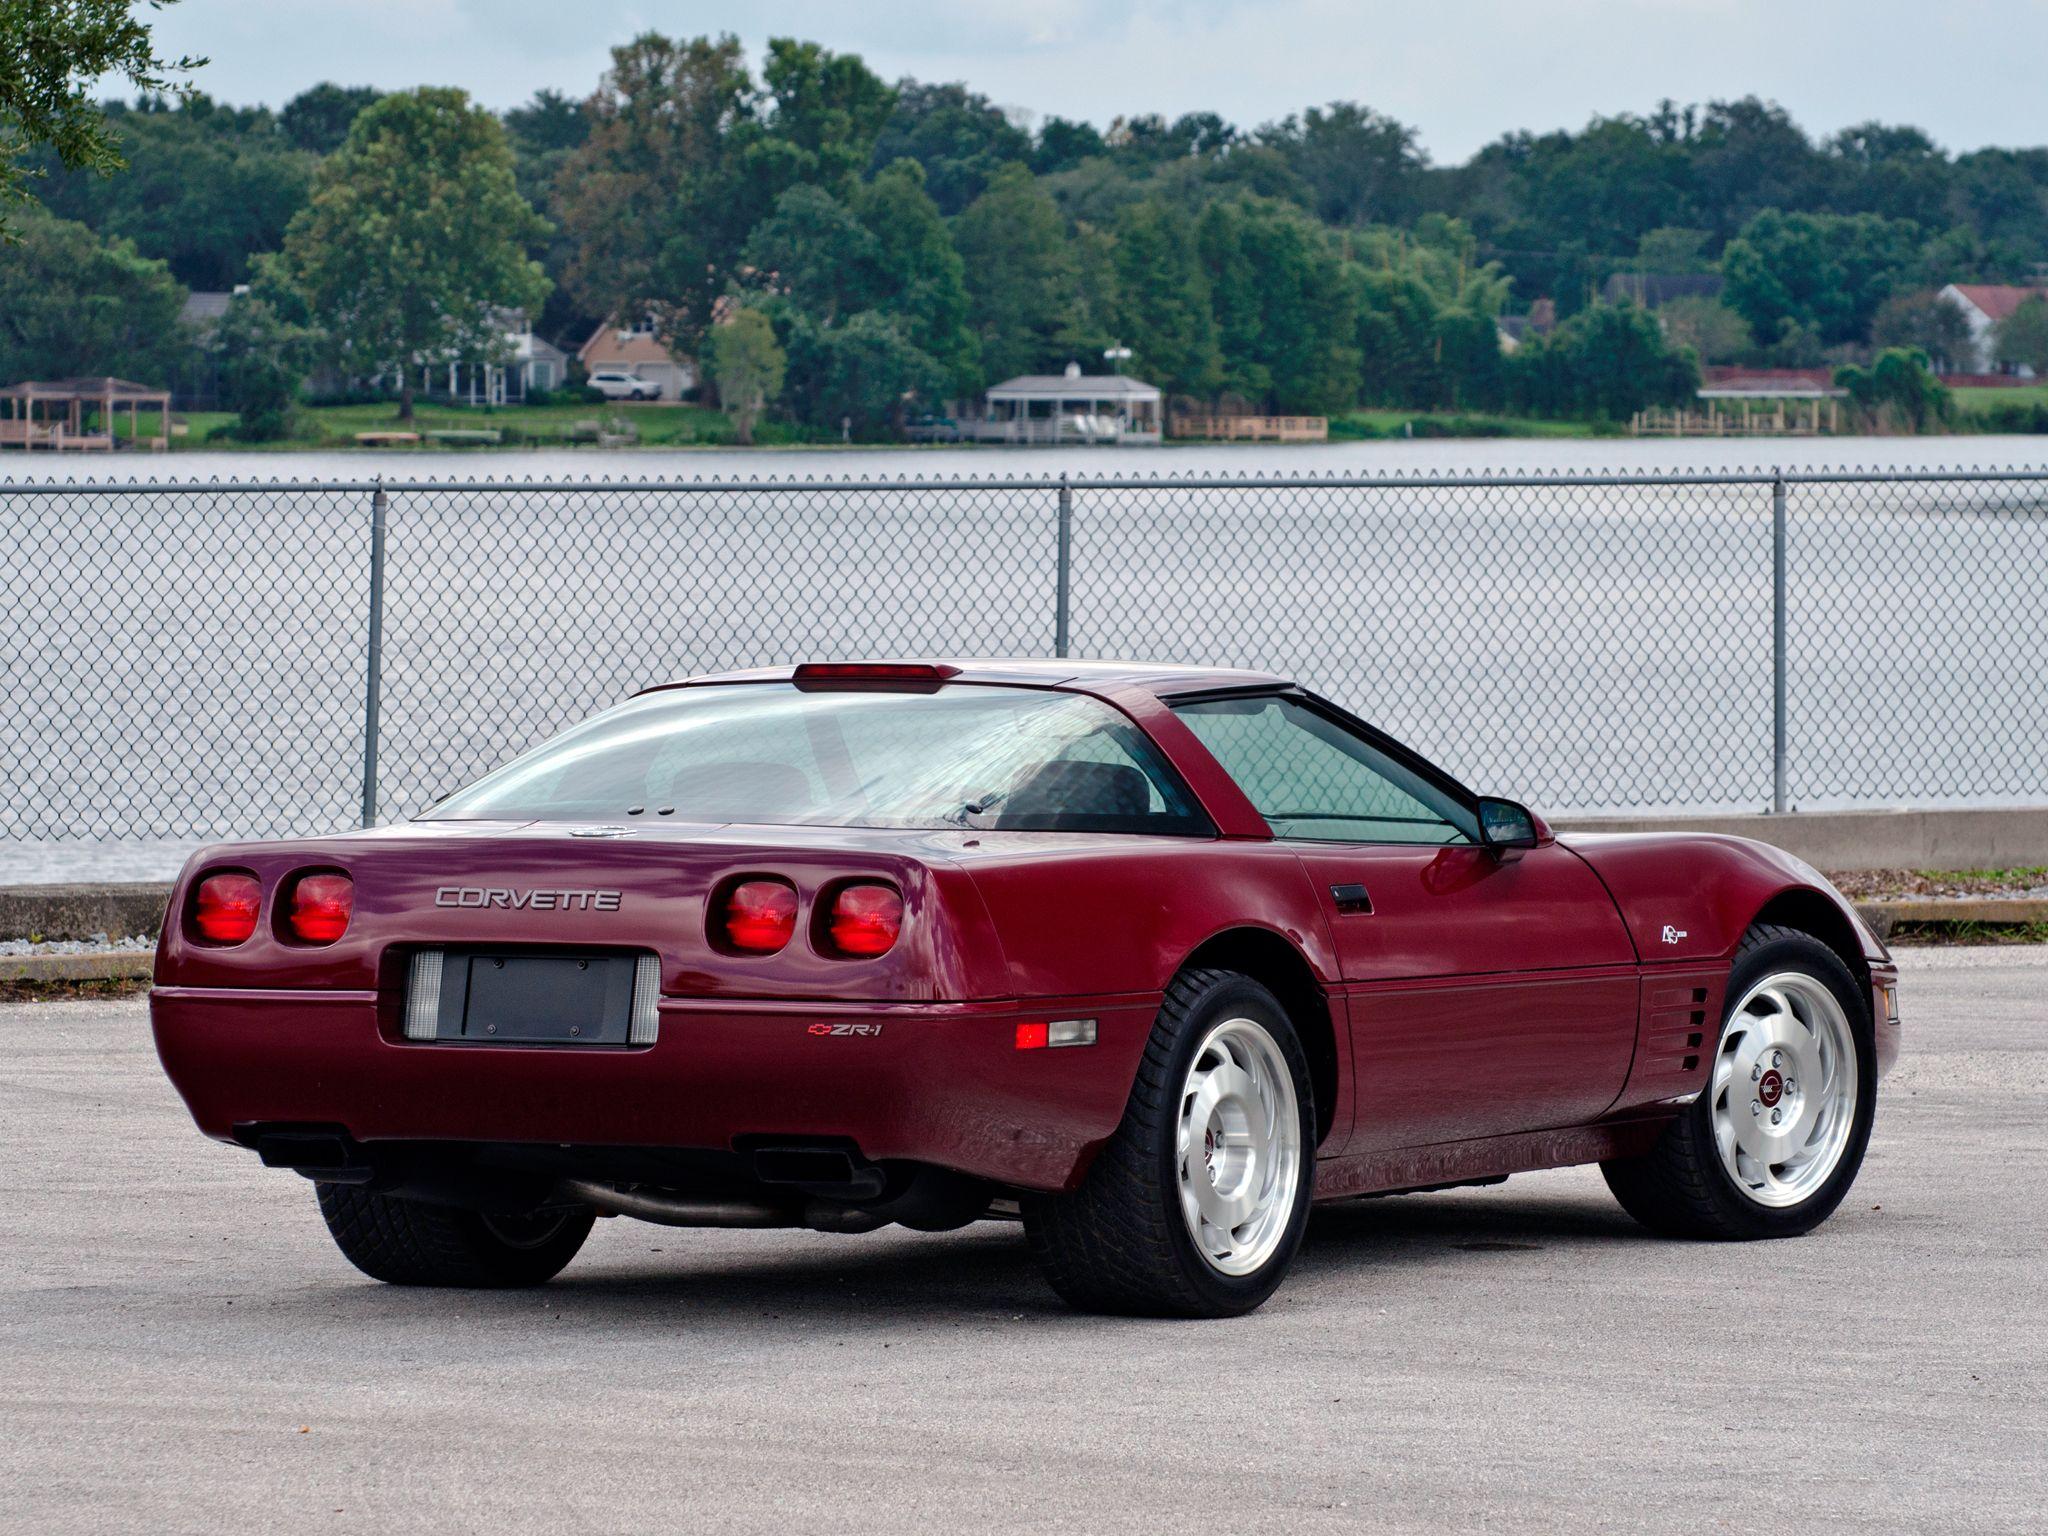 1993 Chevrolet Corvette Zr1 Sport Coupe 40th Anniversary 1yy07